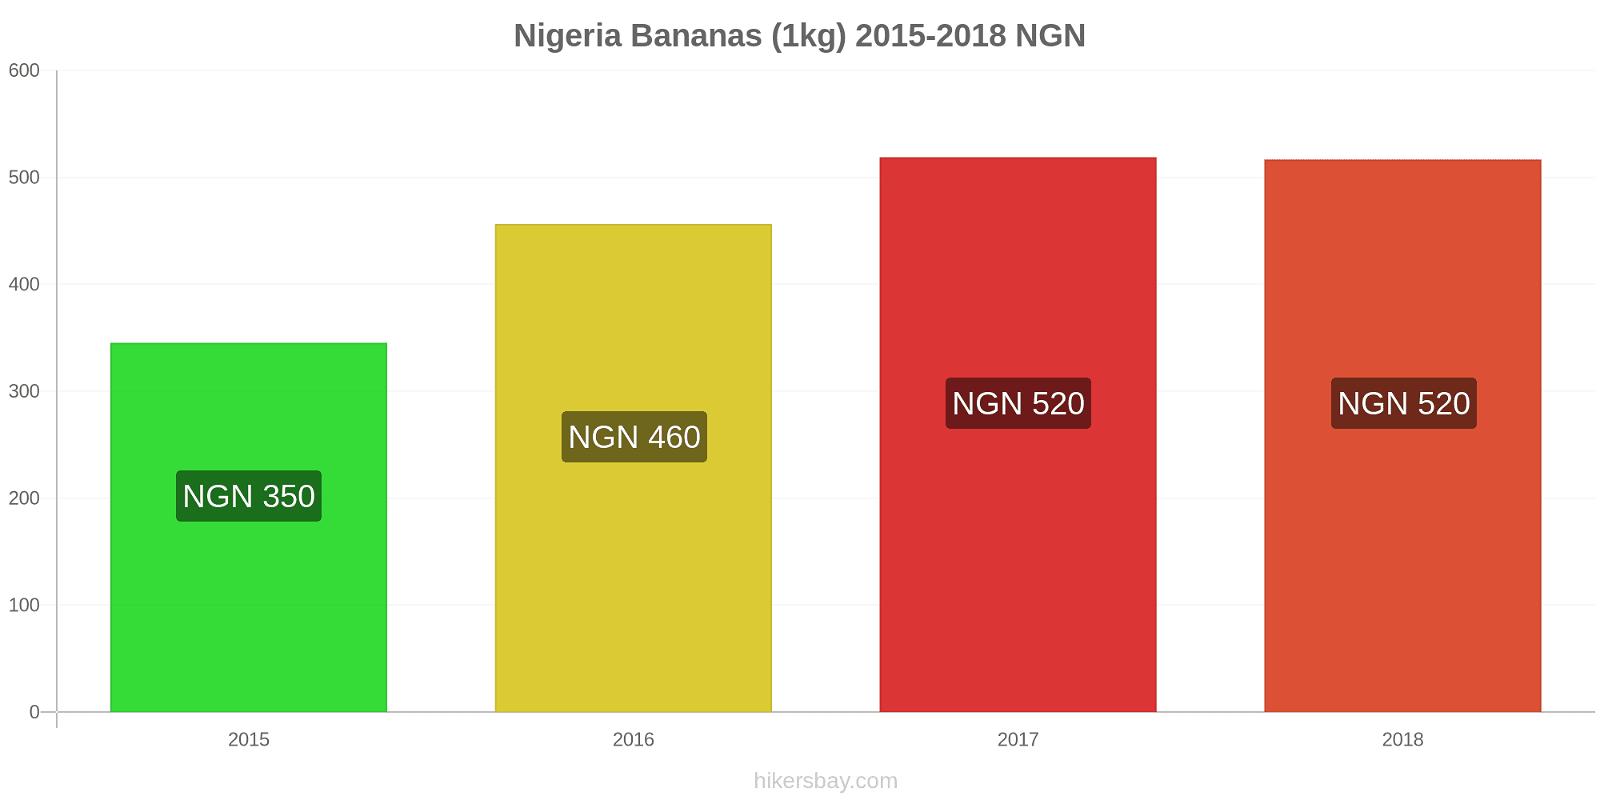 Nigeria price changes Bananas (1kg) hikersbay.com